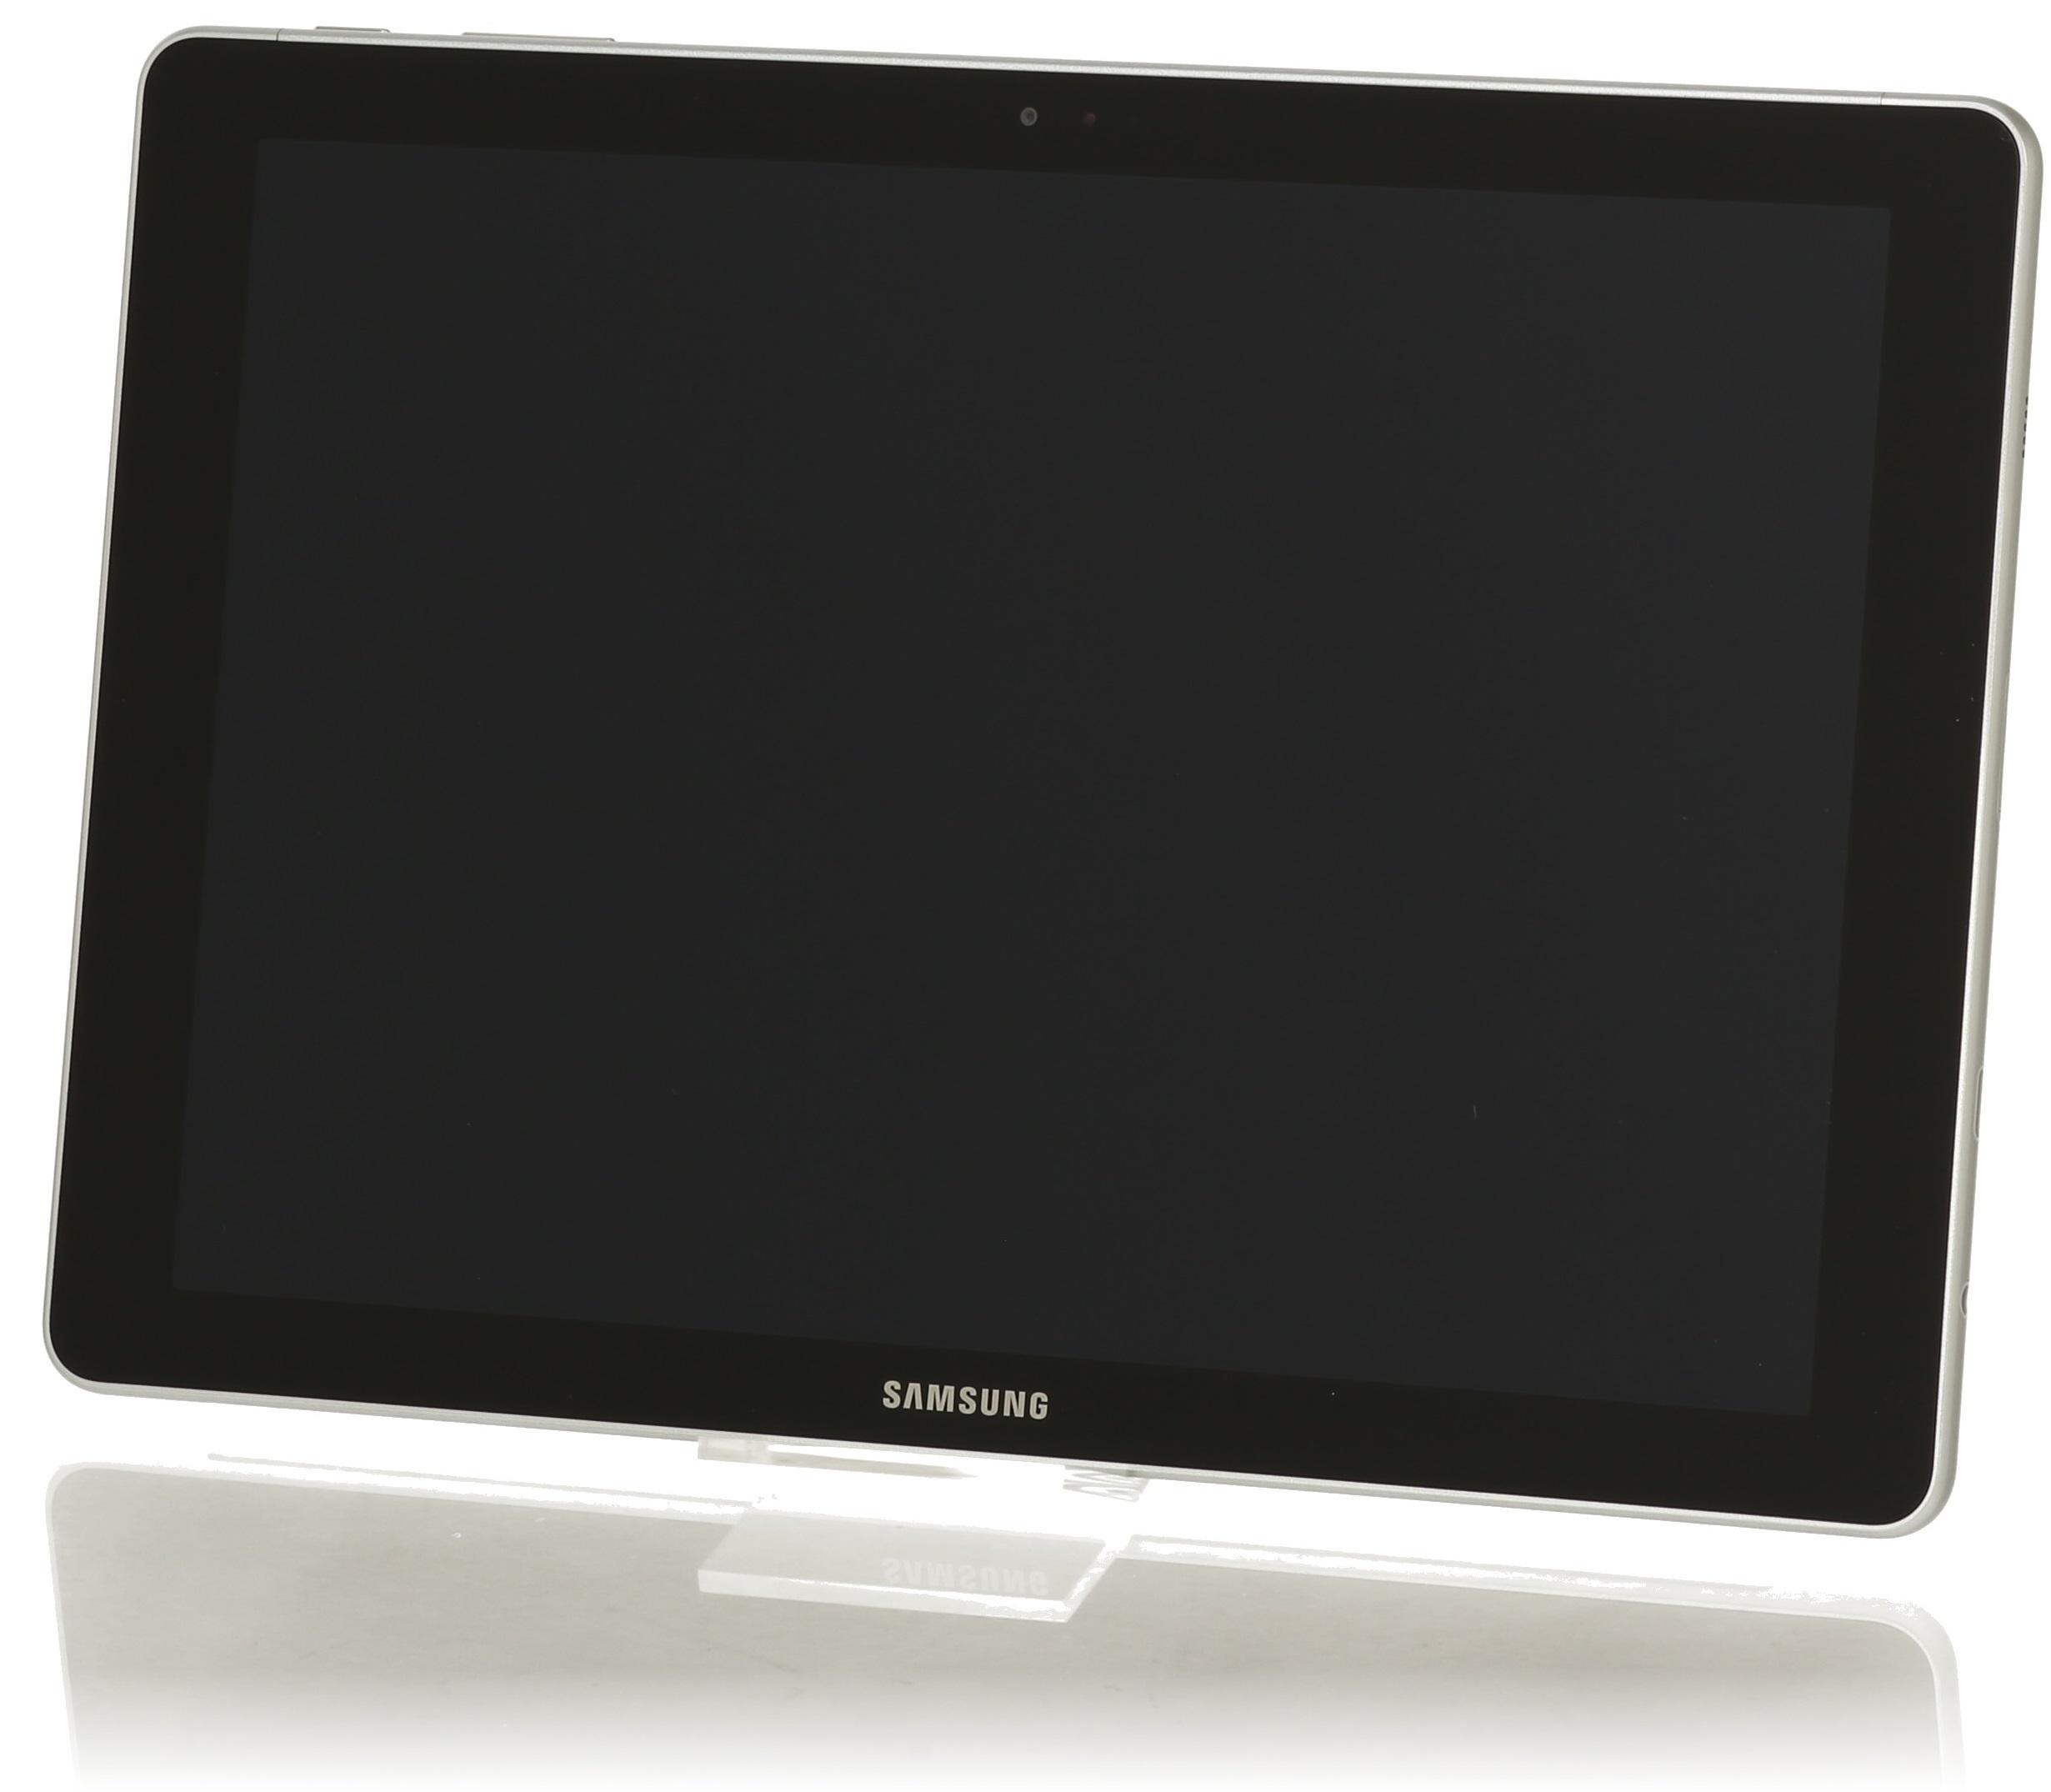 Samsung Galaxy Book 10,6 64GB SSD [Wi-Fi + 4G, inkl. Keyboard Dock] black